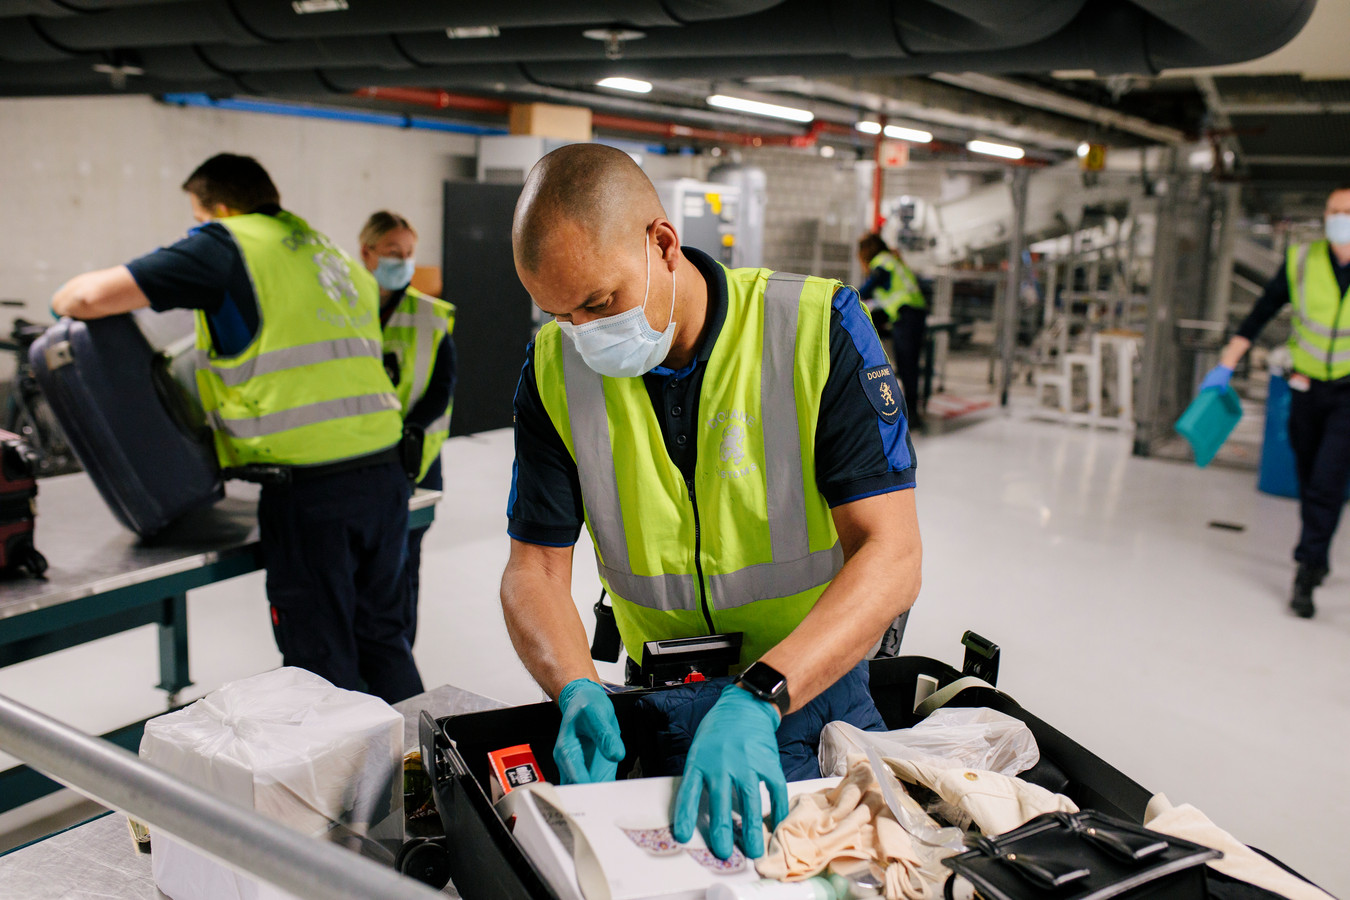 De douane bagage-afhandeling op Schiphol.